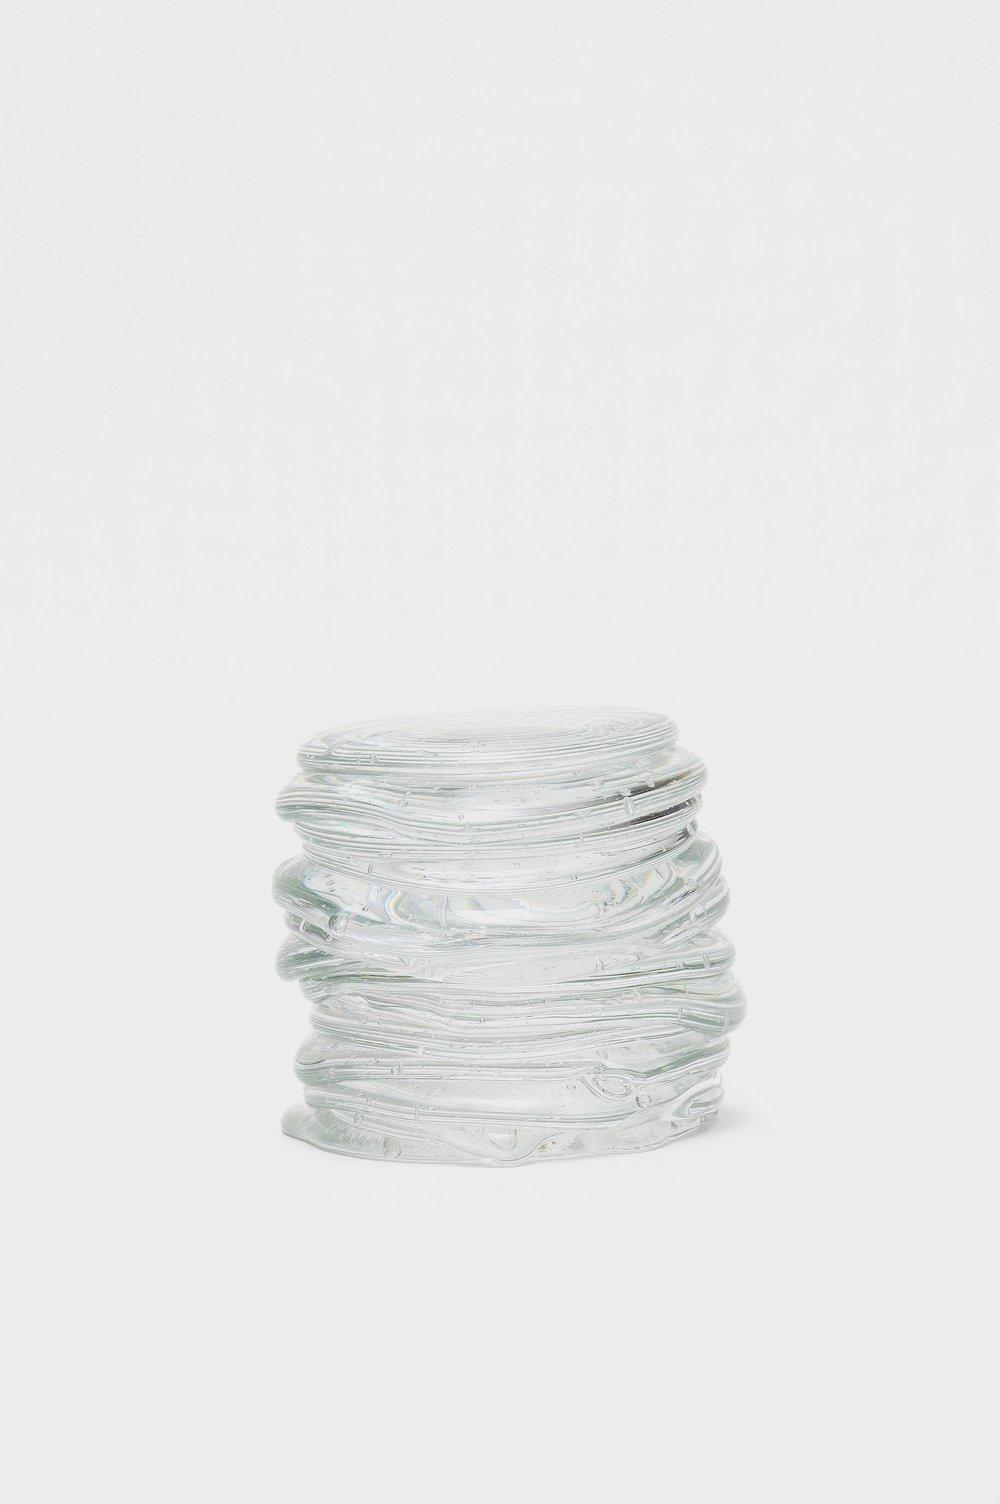 Glass No 3 CCs , 2010